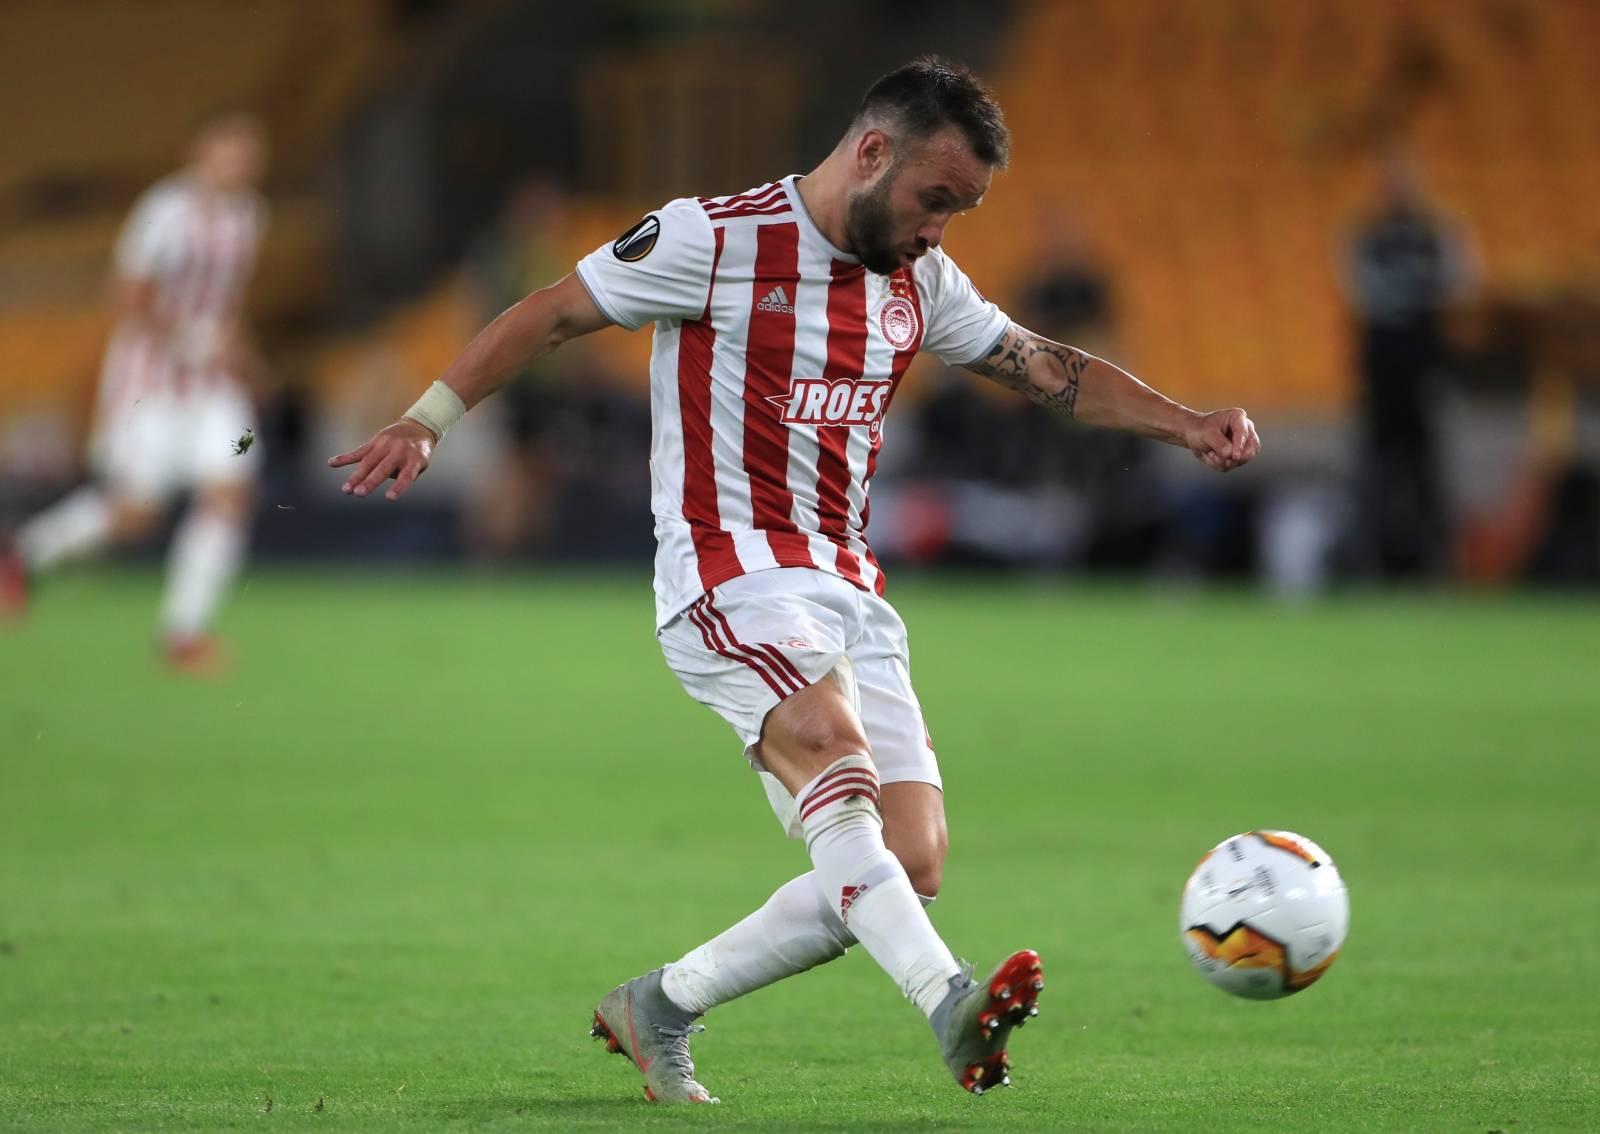 Wolverhampton Wanderers v Olympiakos - UEFA Europa League - Round of 16 - Second Leg - Molineux